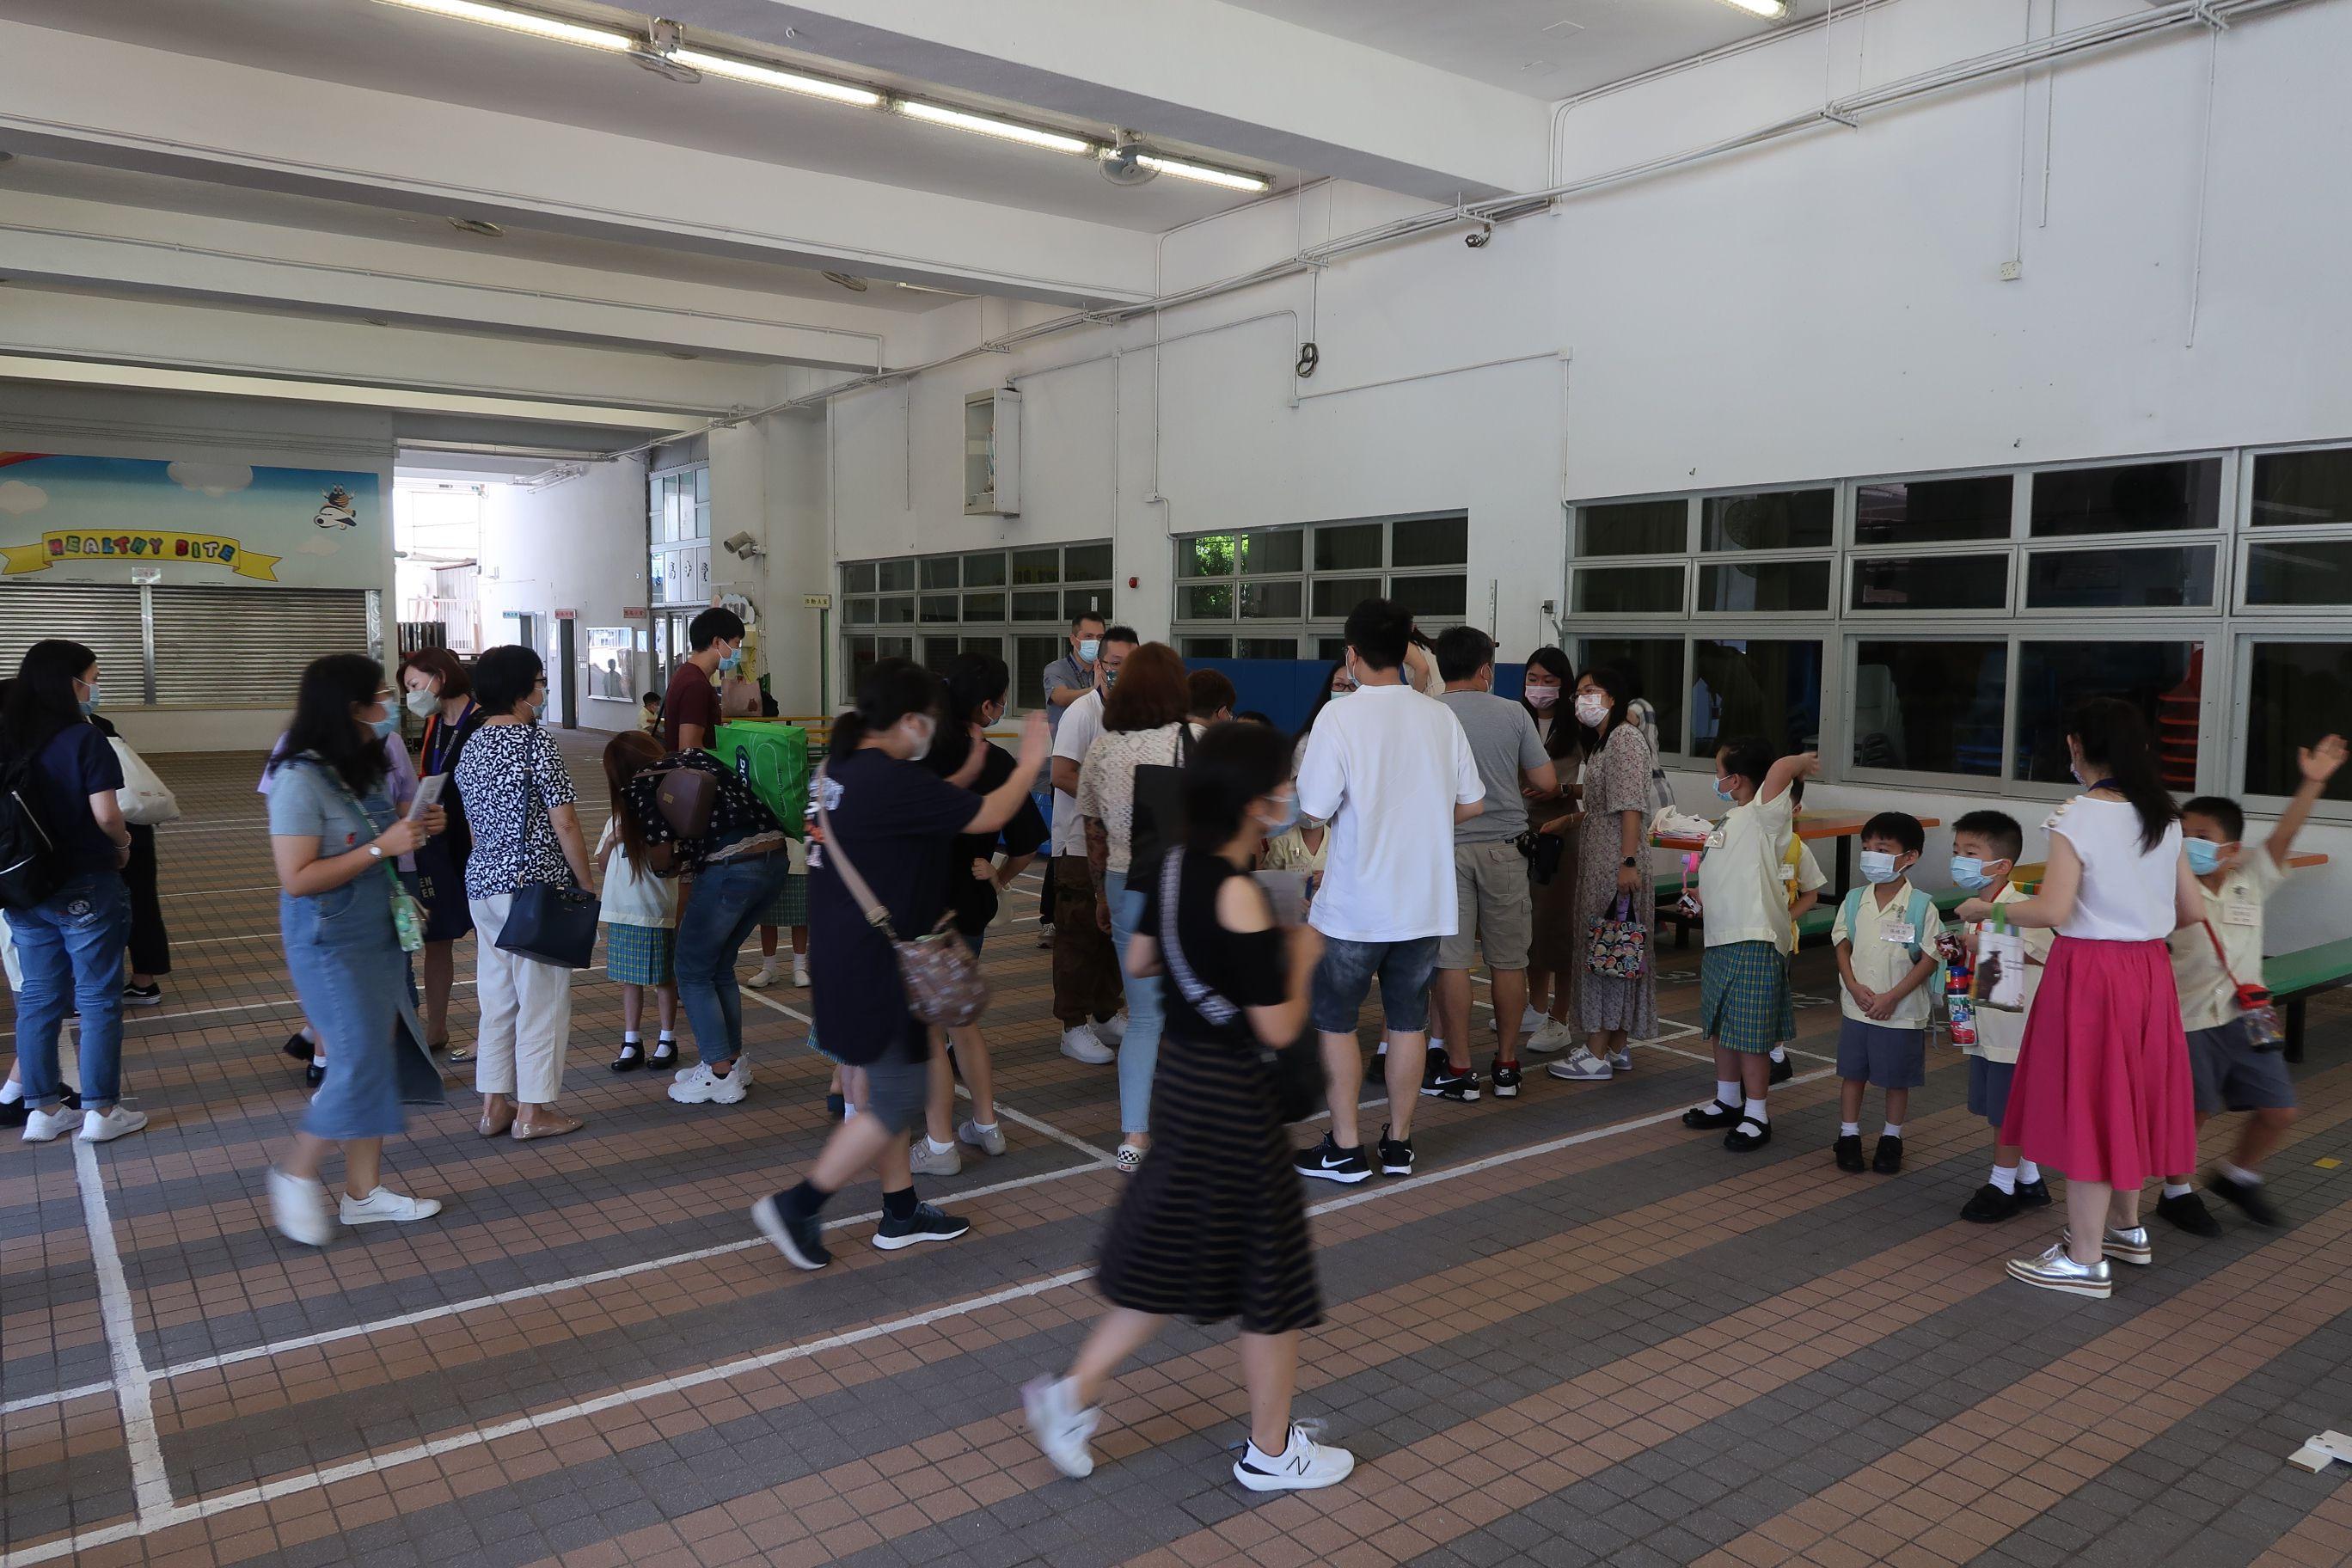 https://syh.edu.hk/sites/default/files/img_6627.jpg